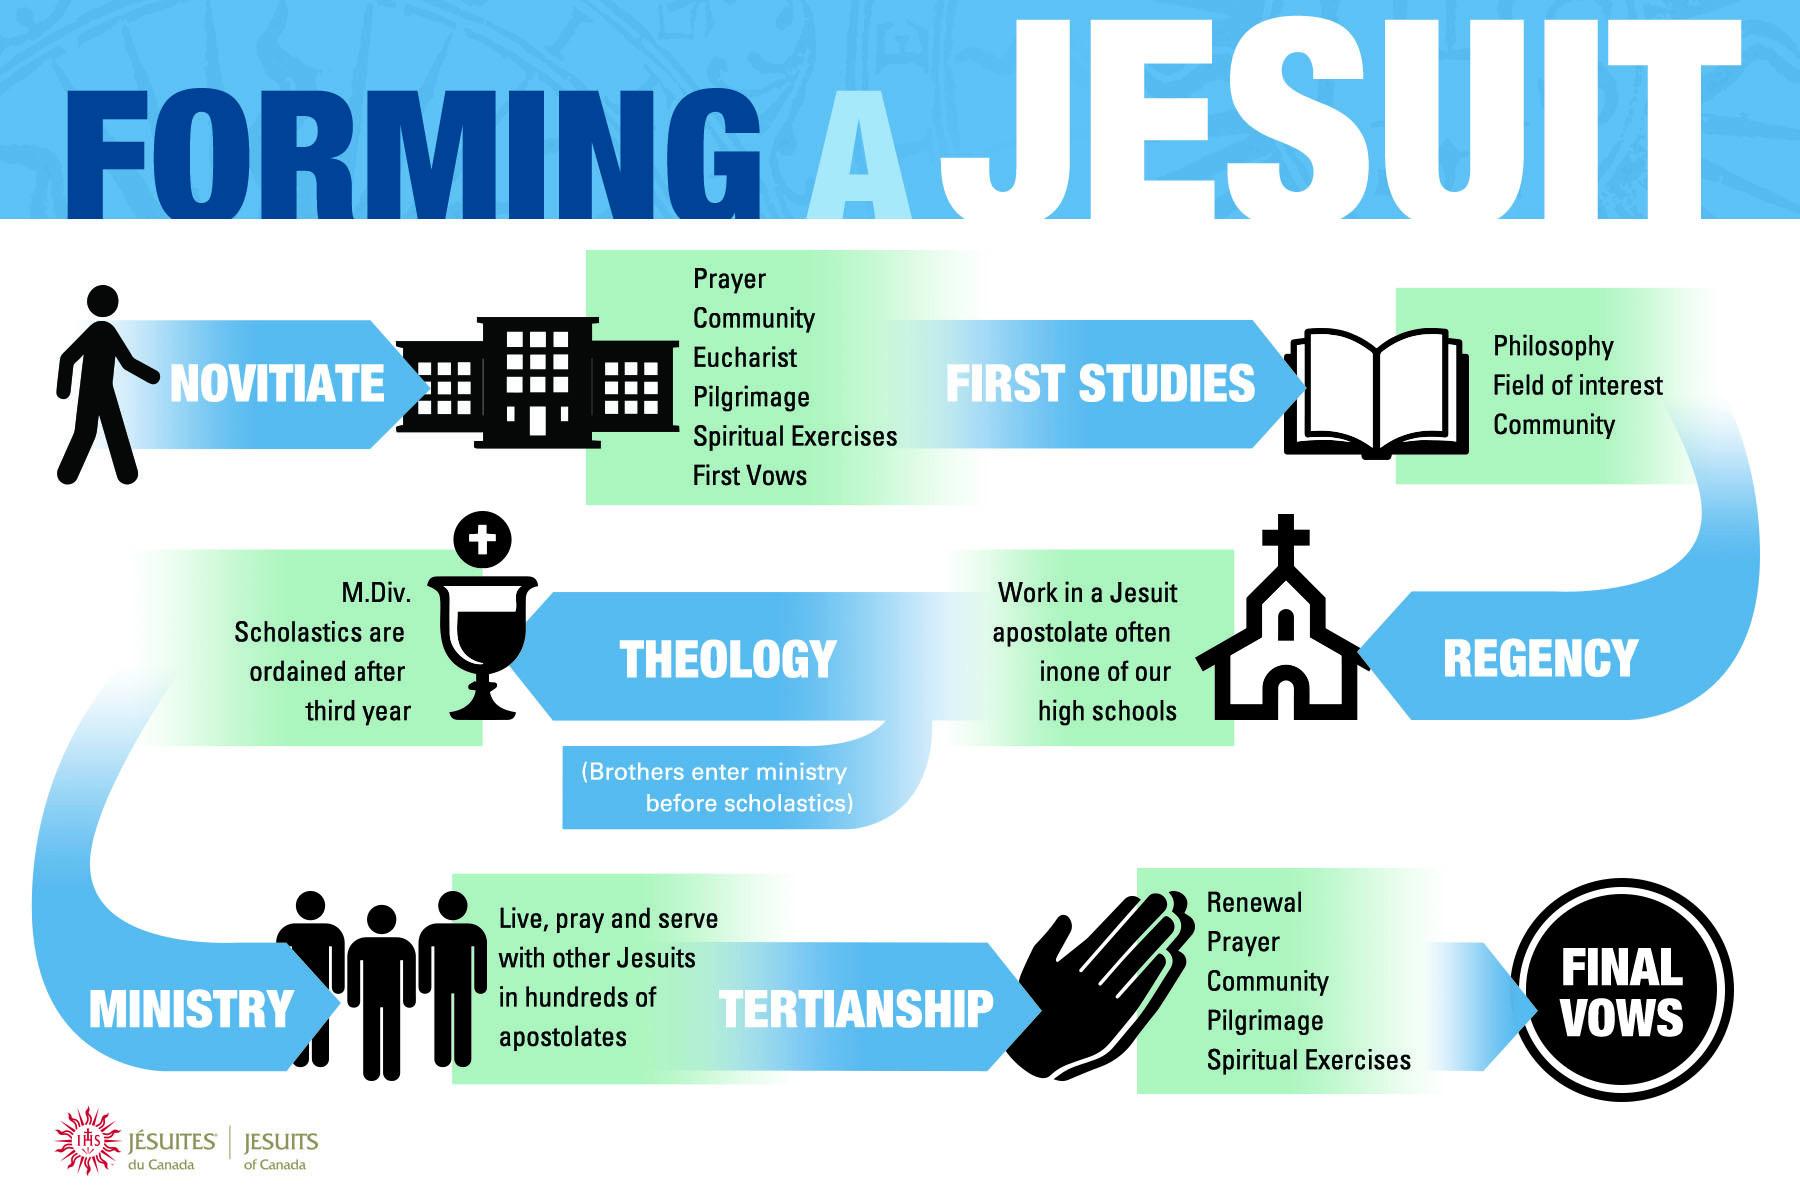 Source: jesuits.ca